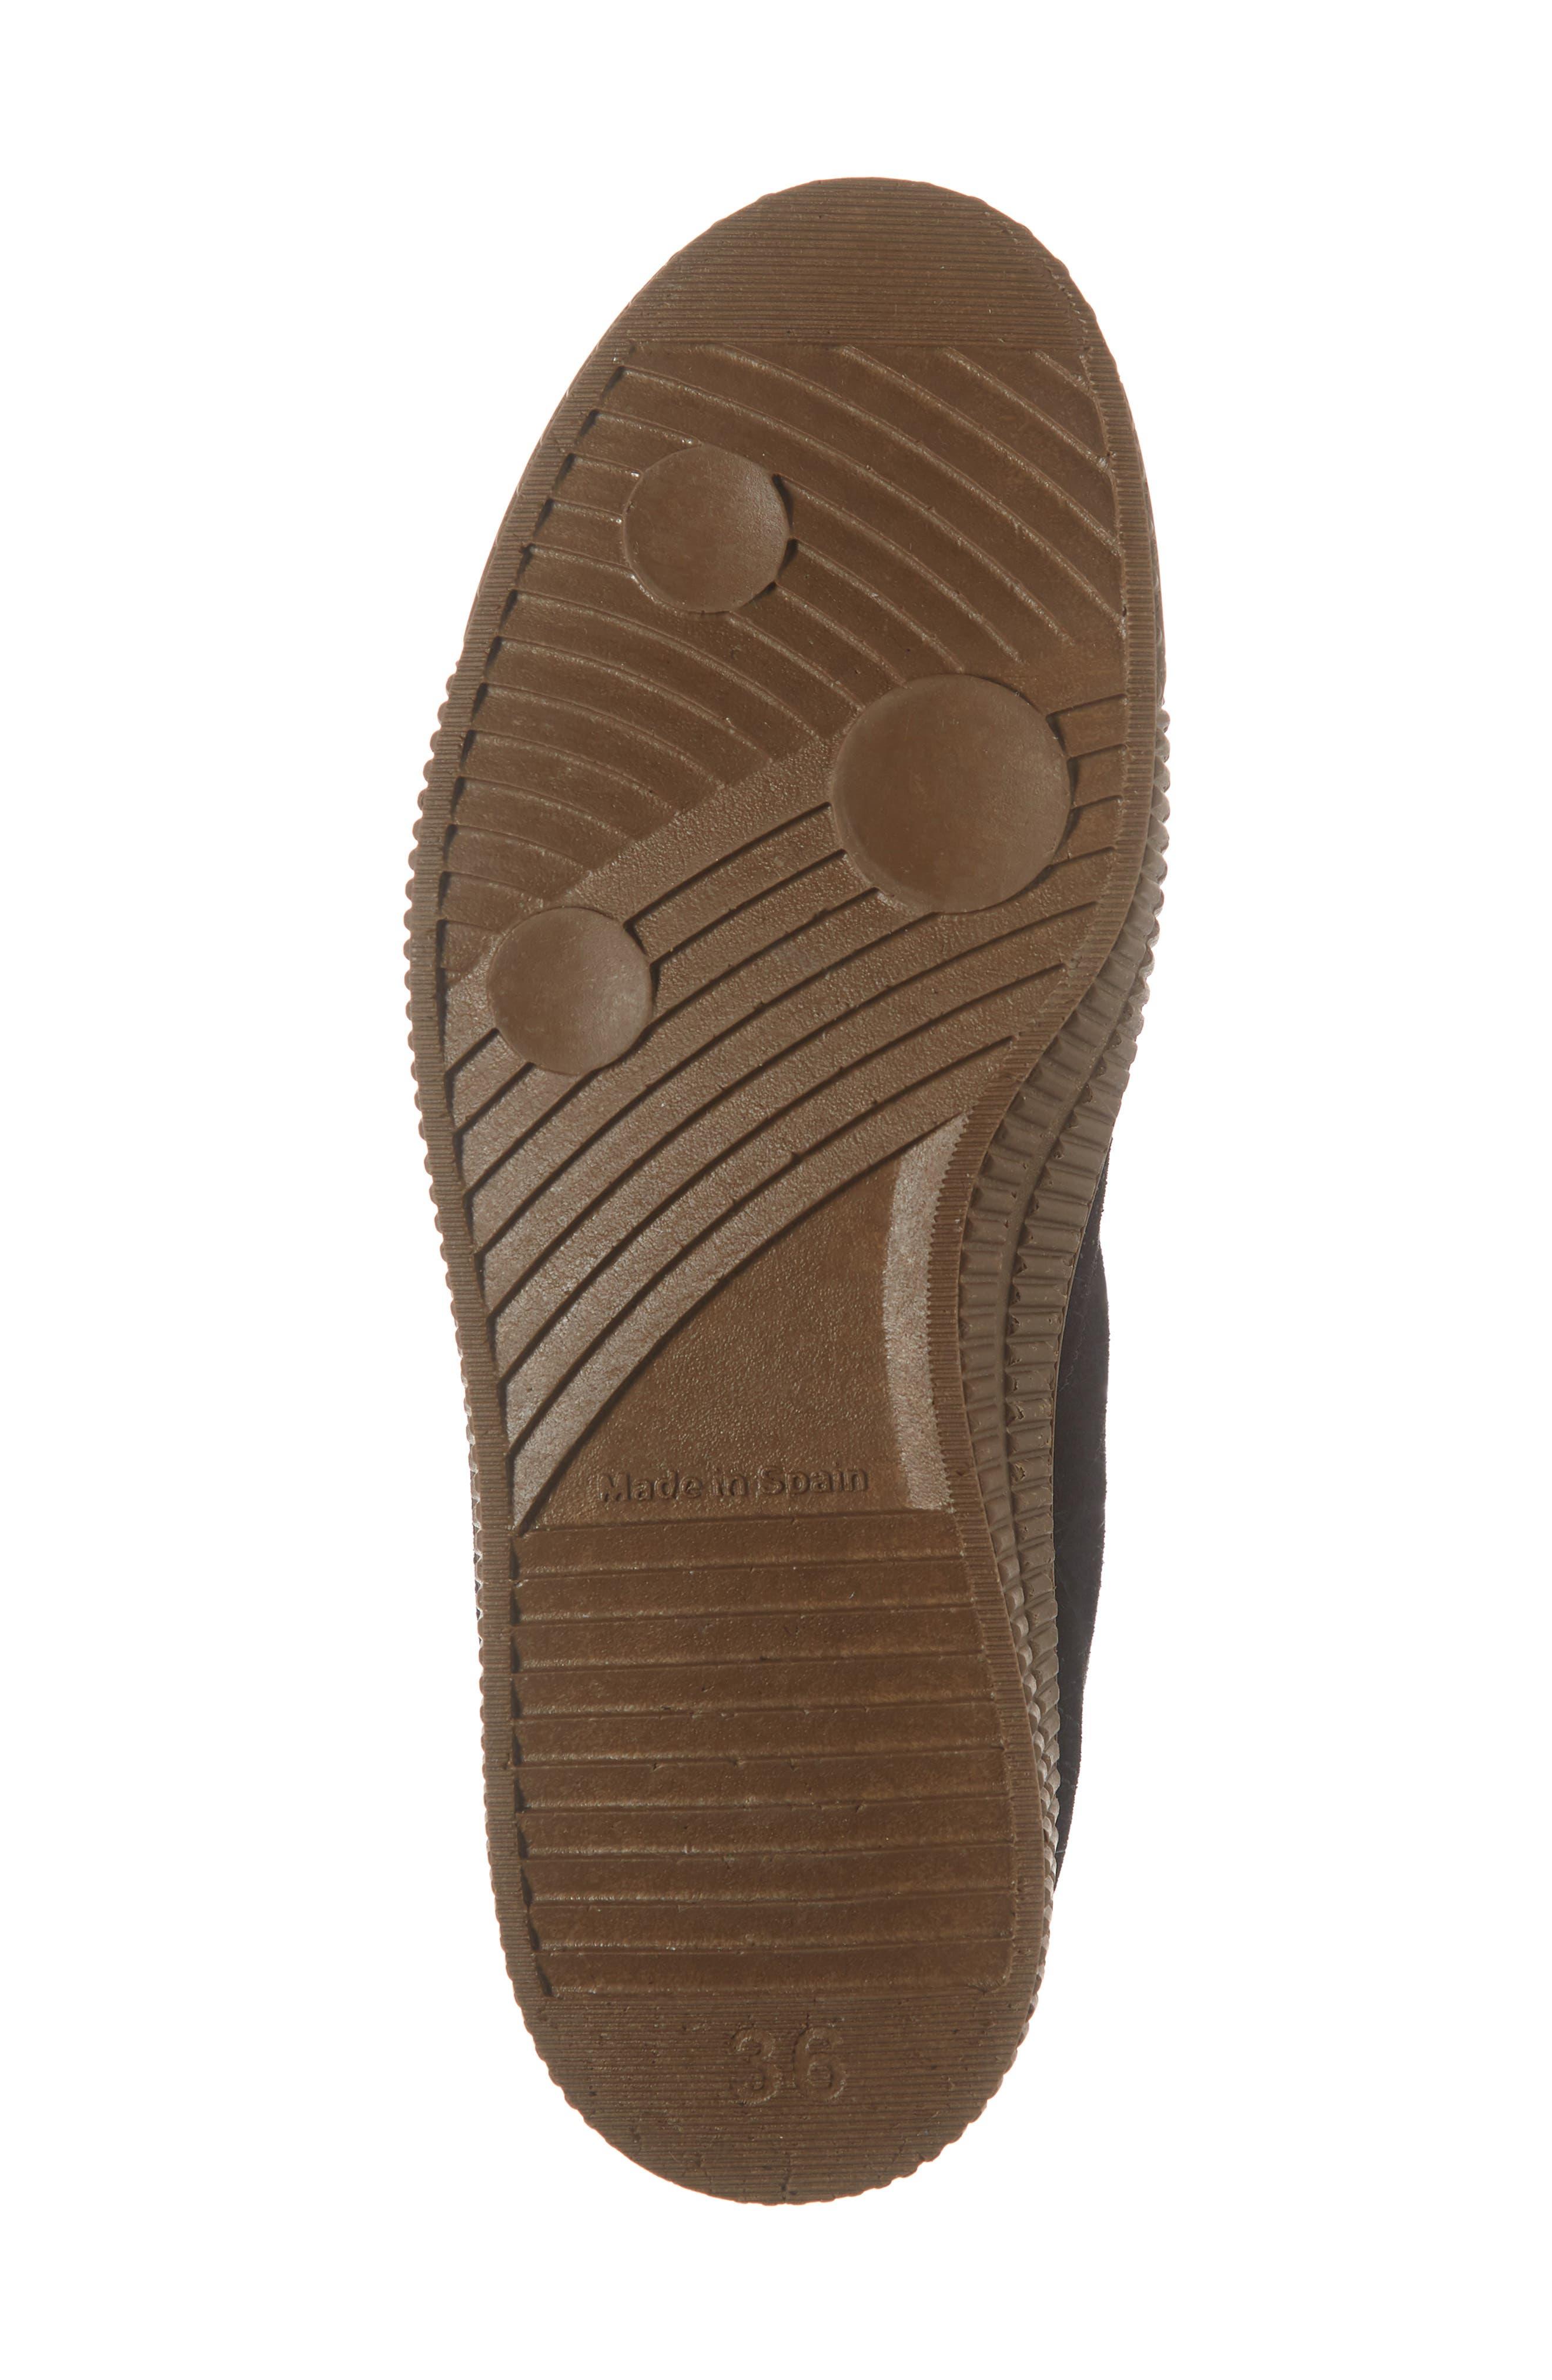 Femp High Top Sneaker,                             Alternate thumbnail 6, color,                             BLACK/ CAMEL SUEDE